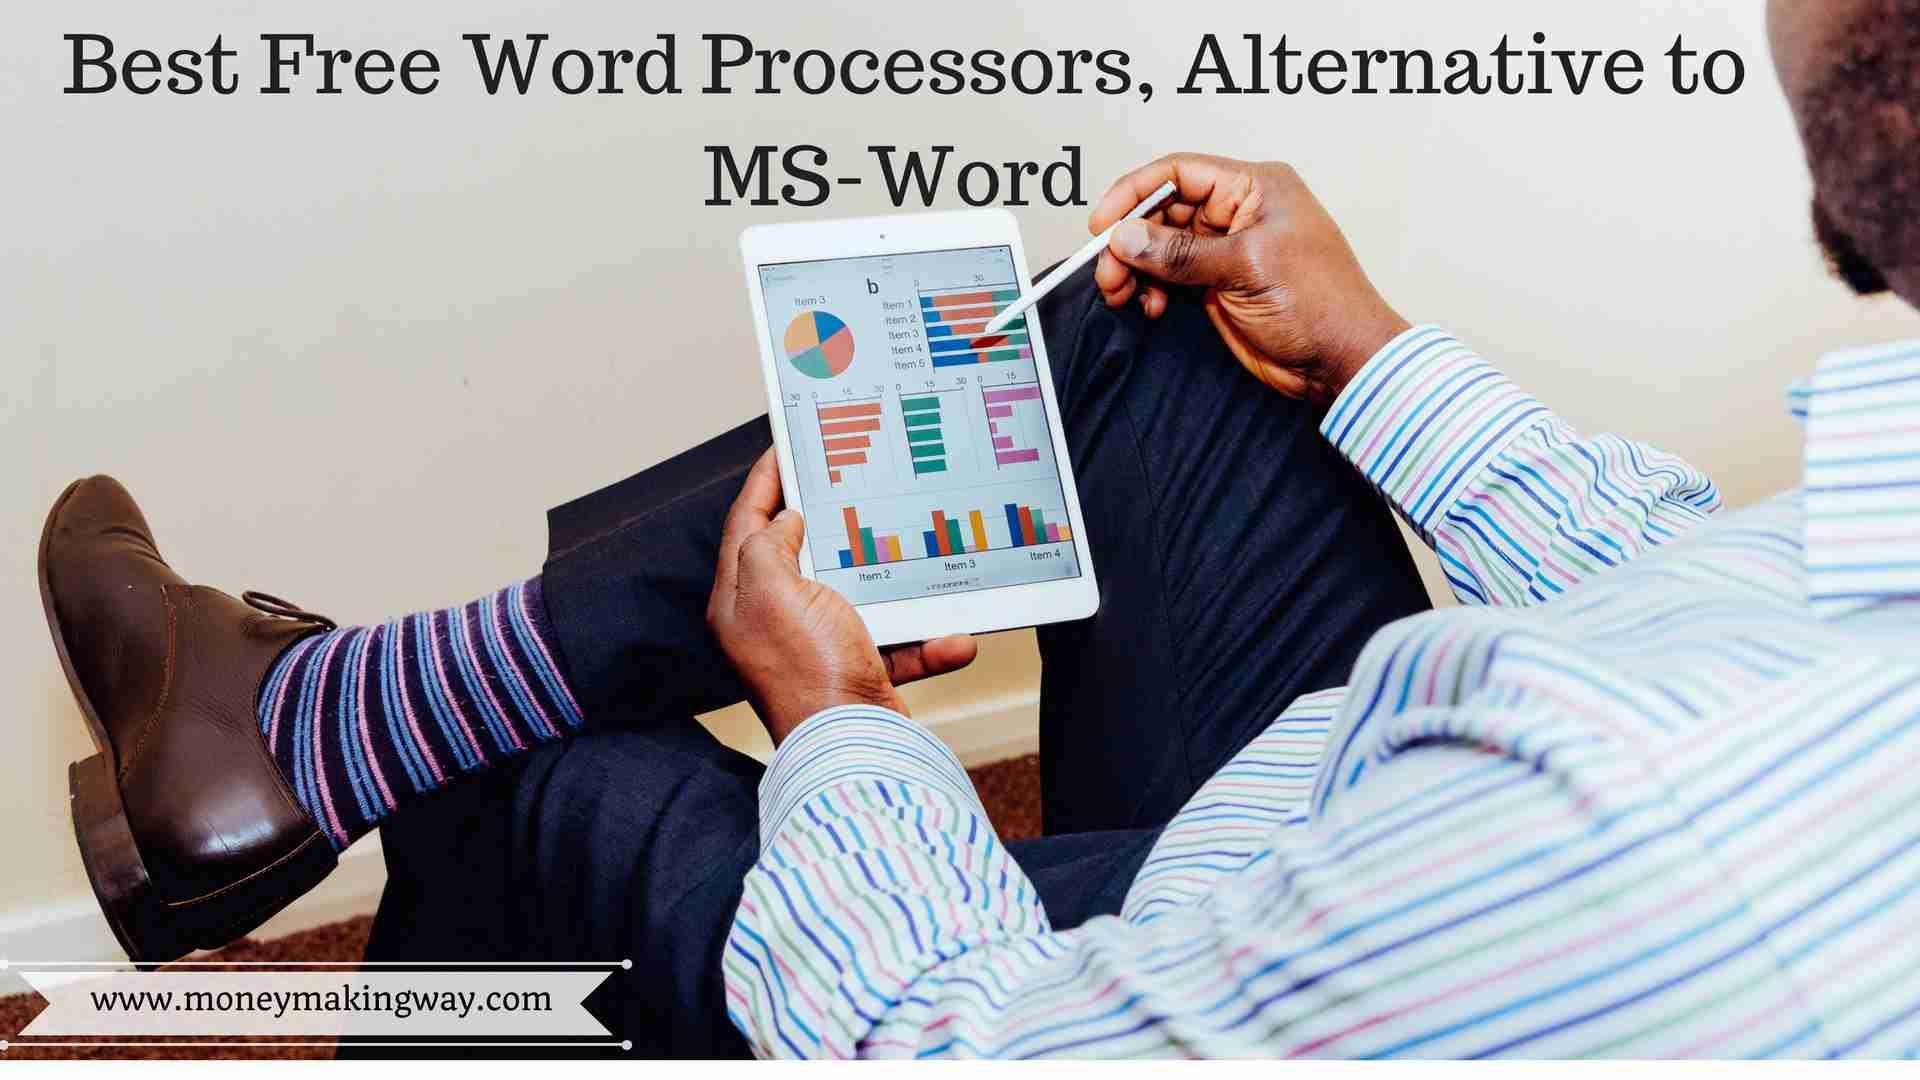 Free word processors